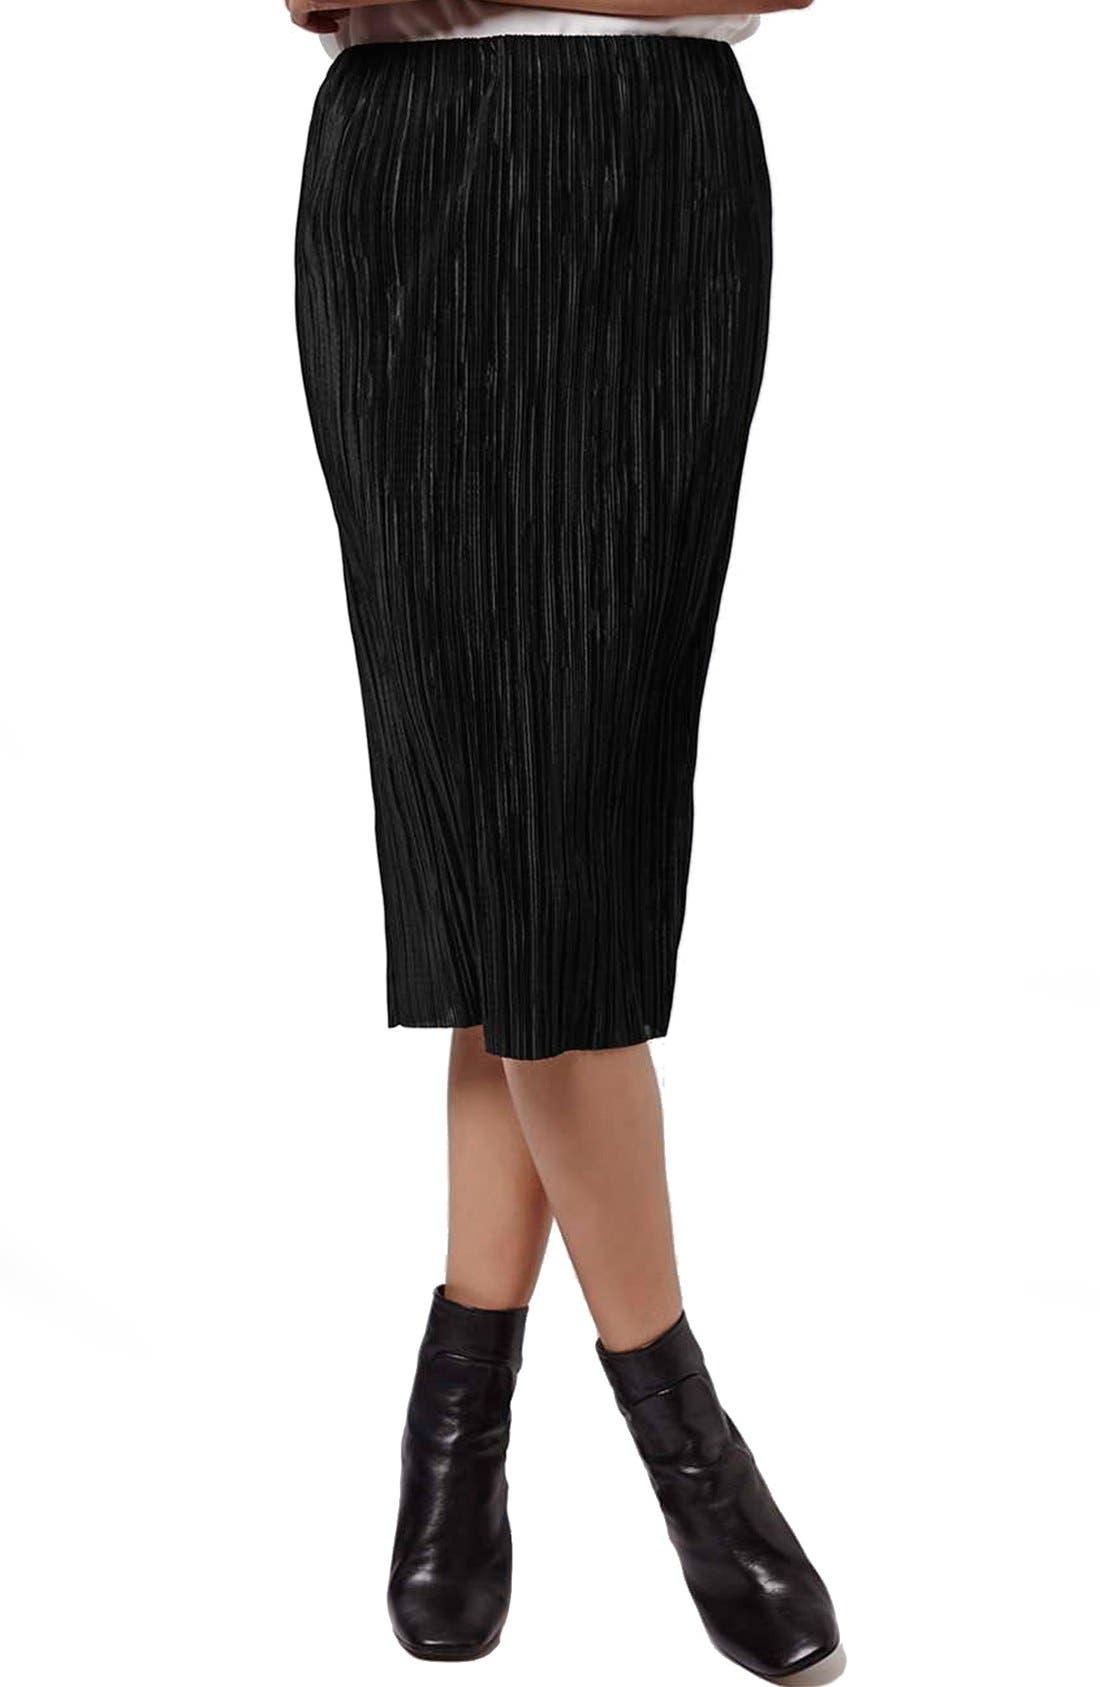 Alternate Image 1 Selected - Topshop Plissé Tube Skirt